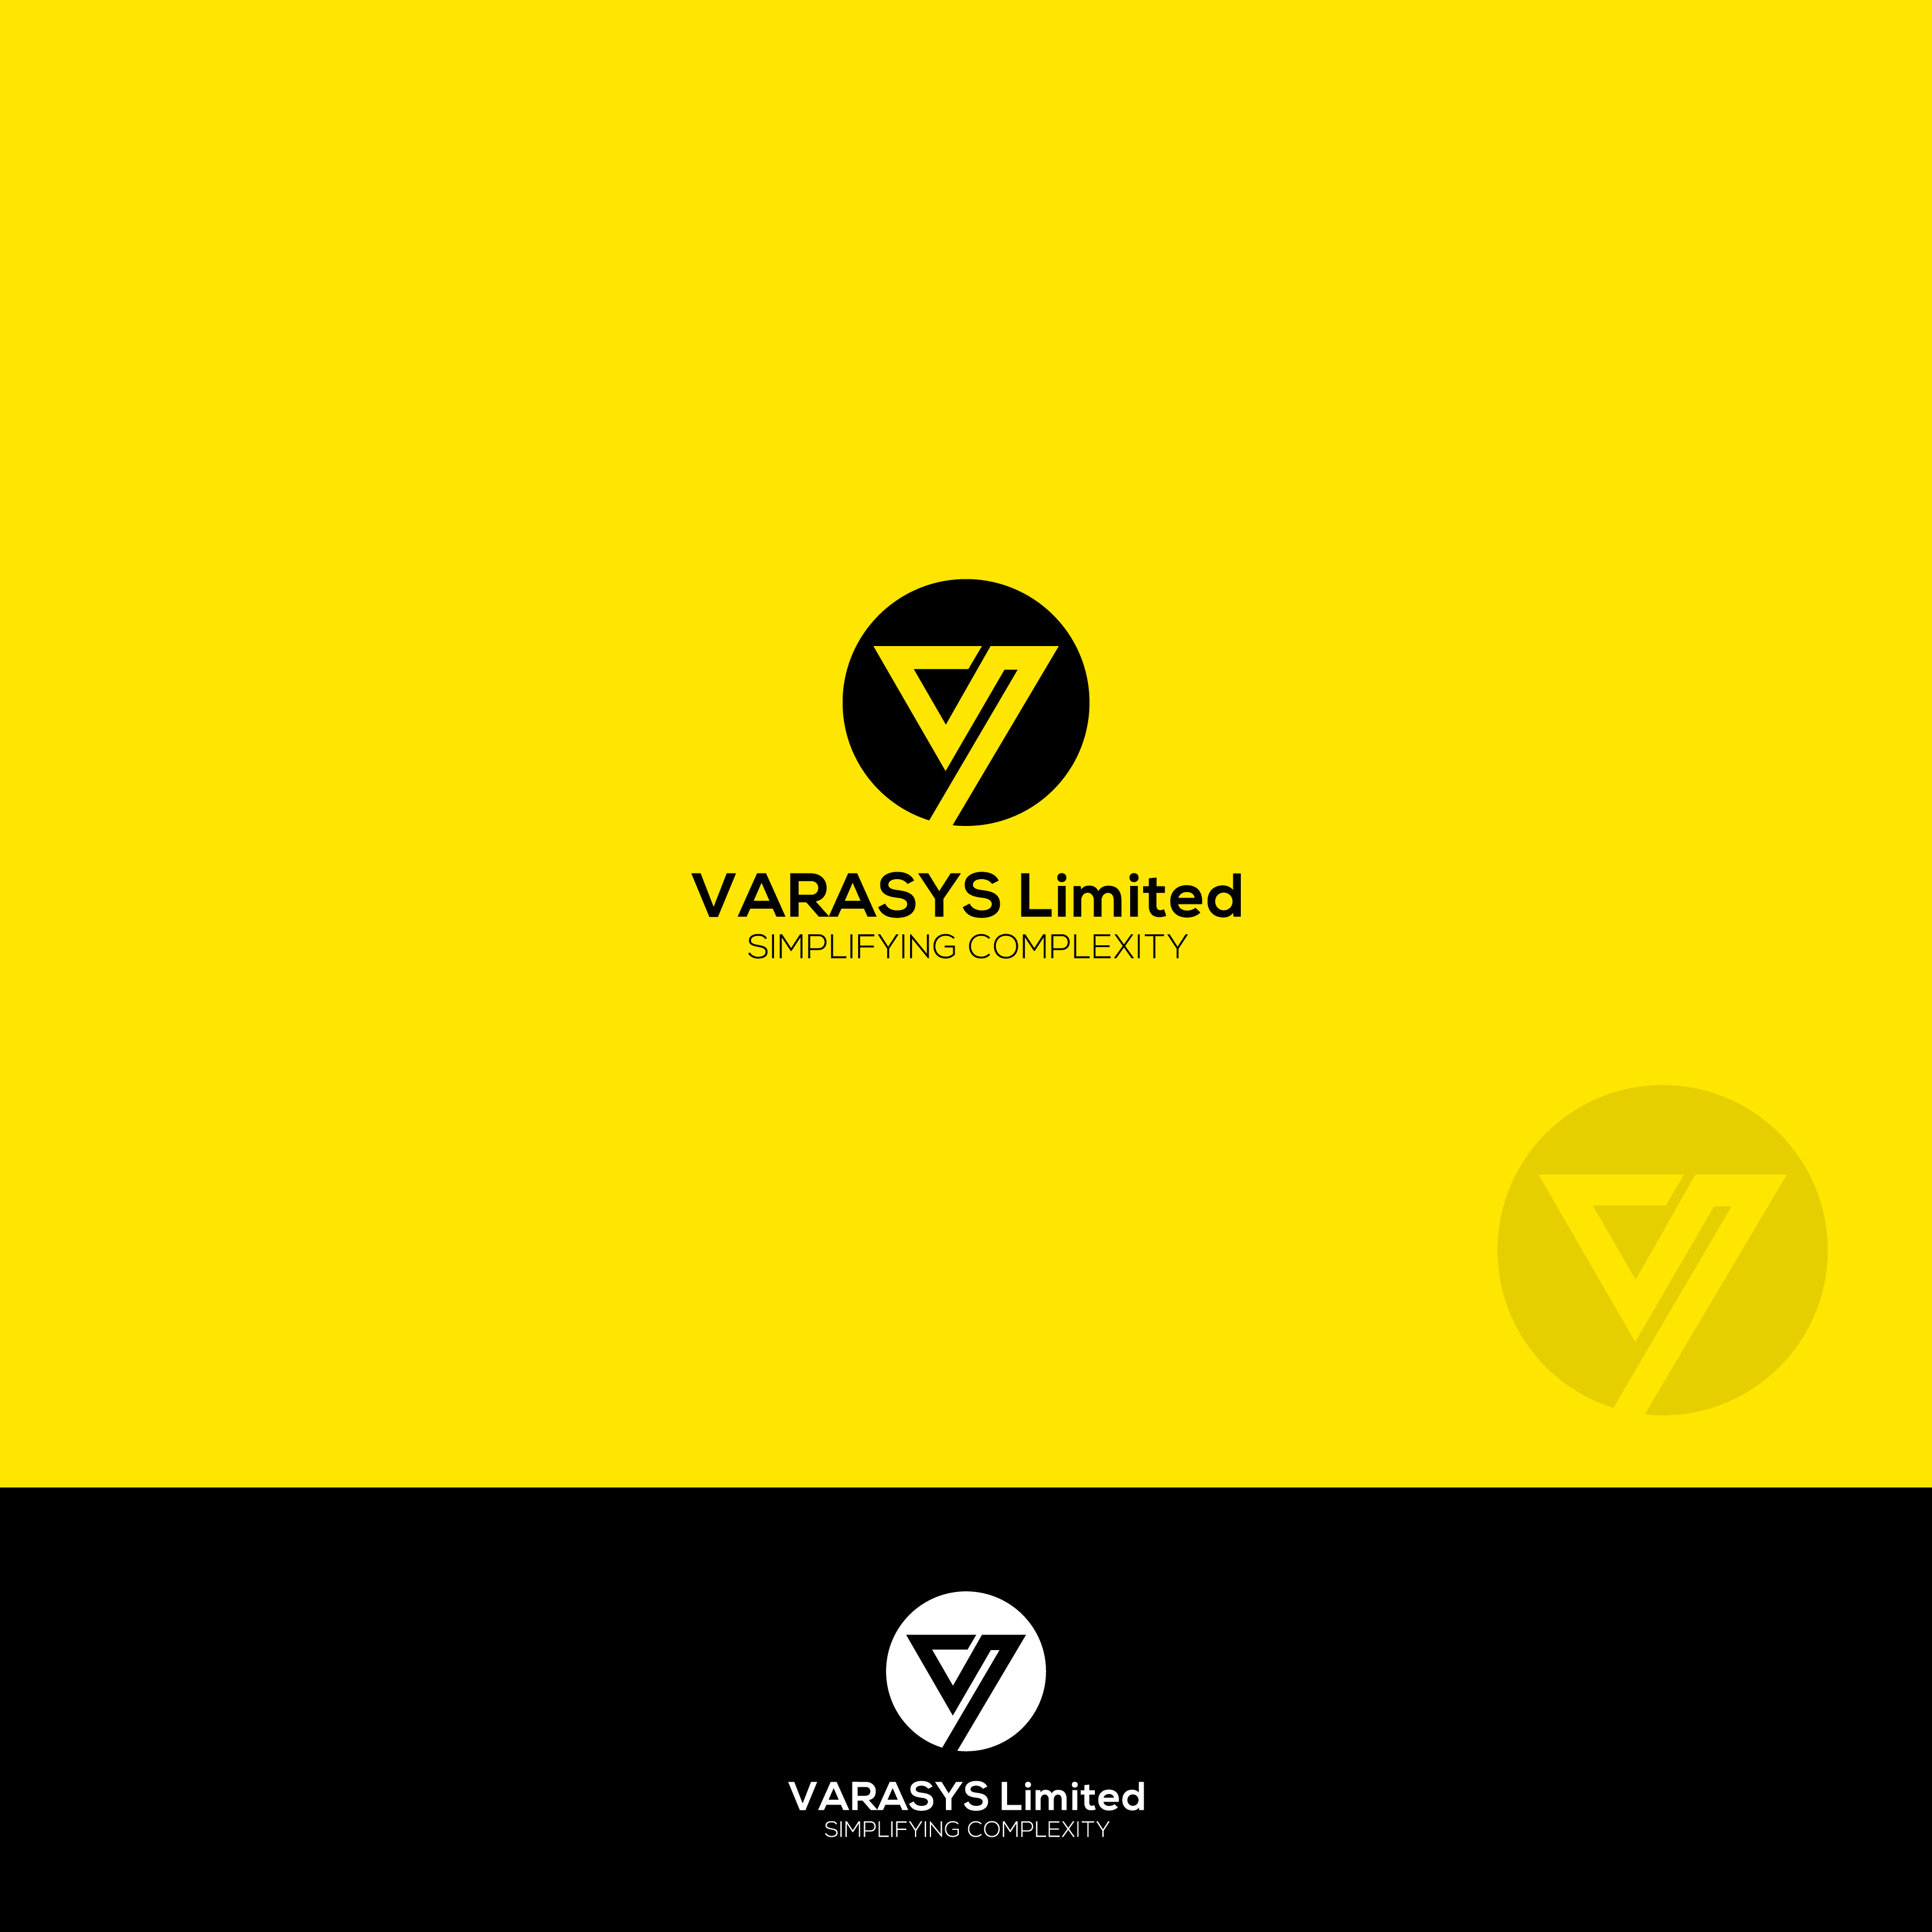 Logo Design by Al Alif - Entry No. 14 in the Logo Design Contest Artistic Logo Design for VARASYS Limited.